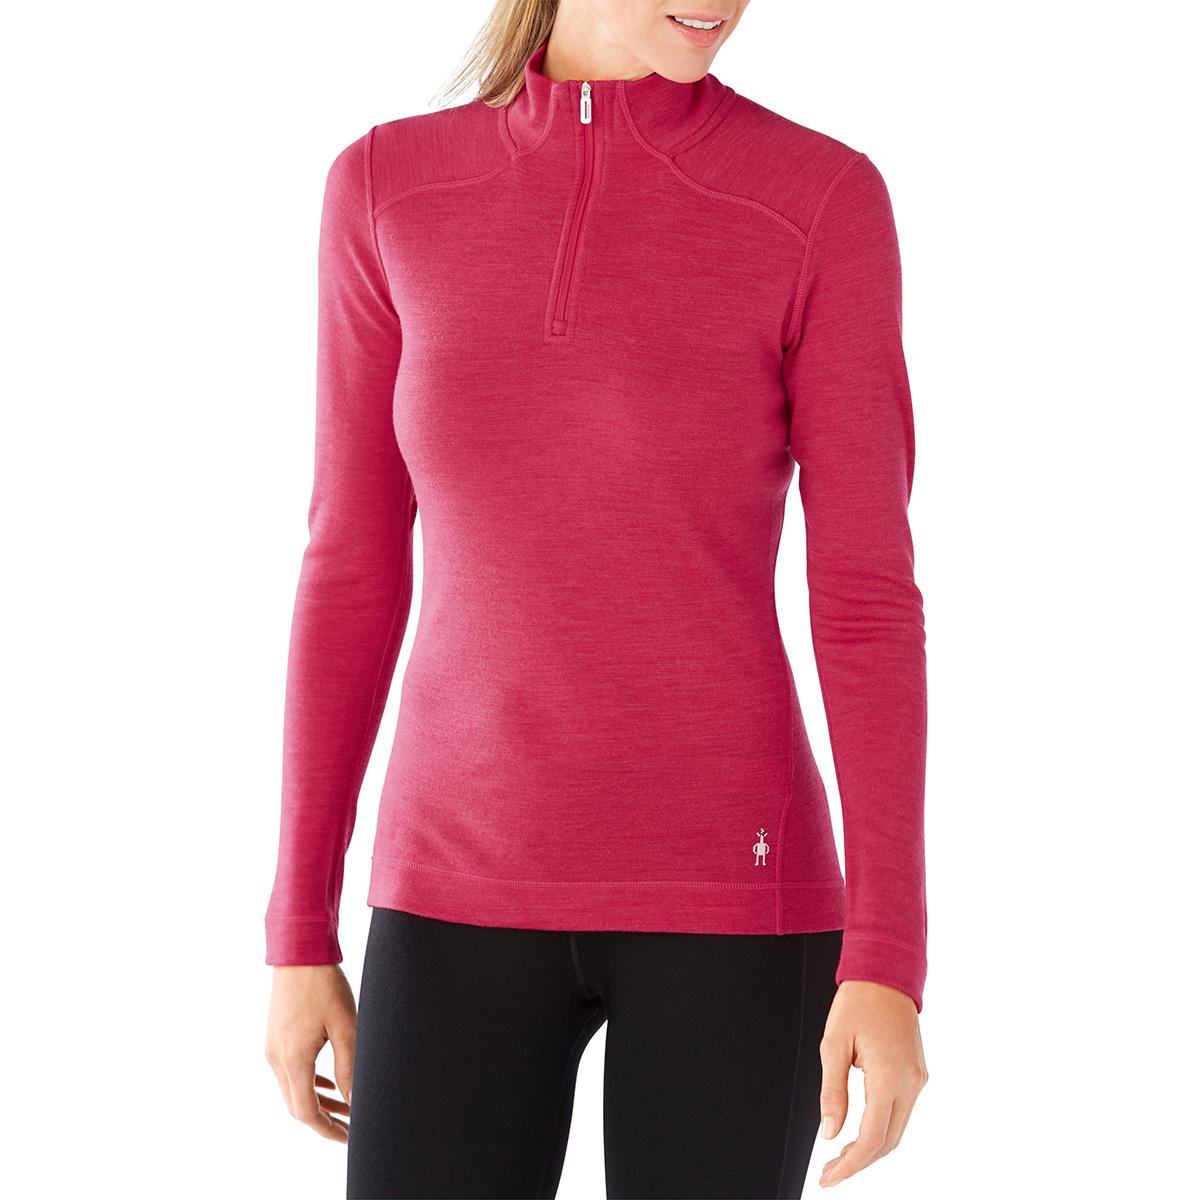 Smartwool Women's Nts Mid 250 Zip T - Red, XL